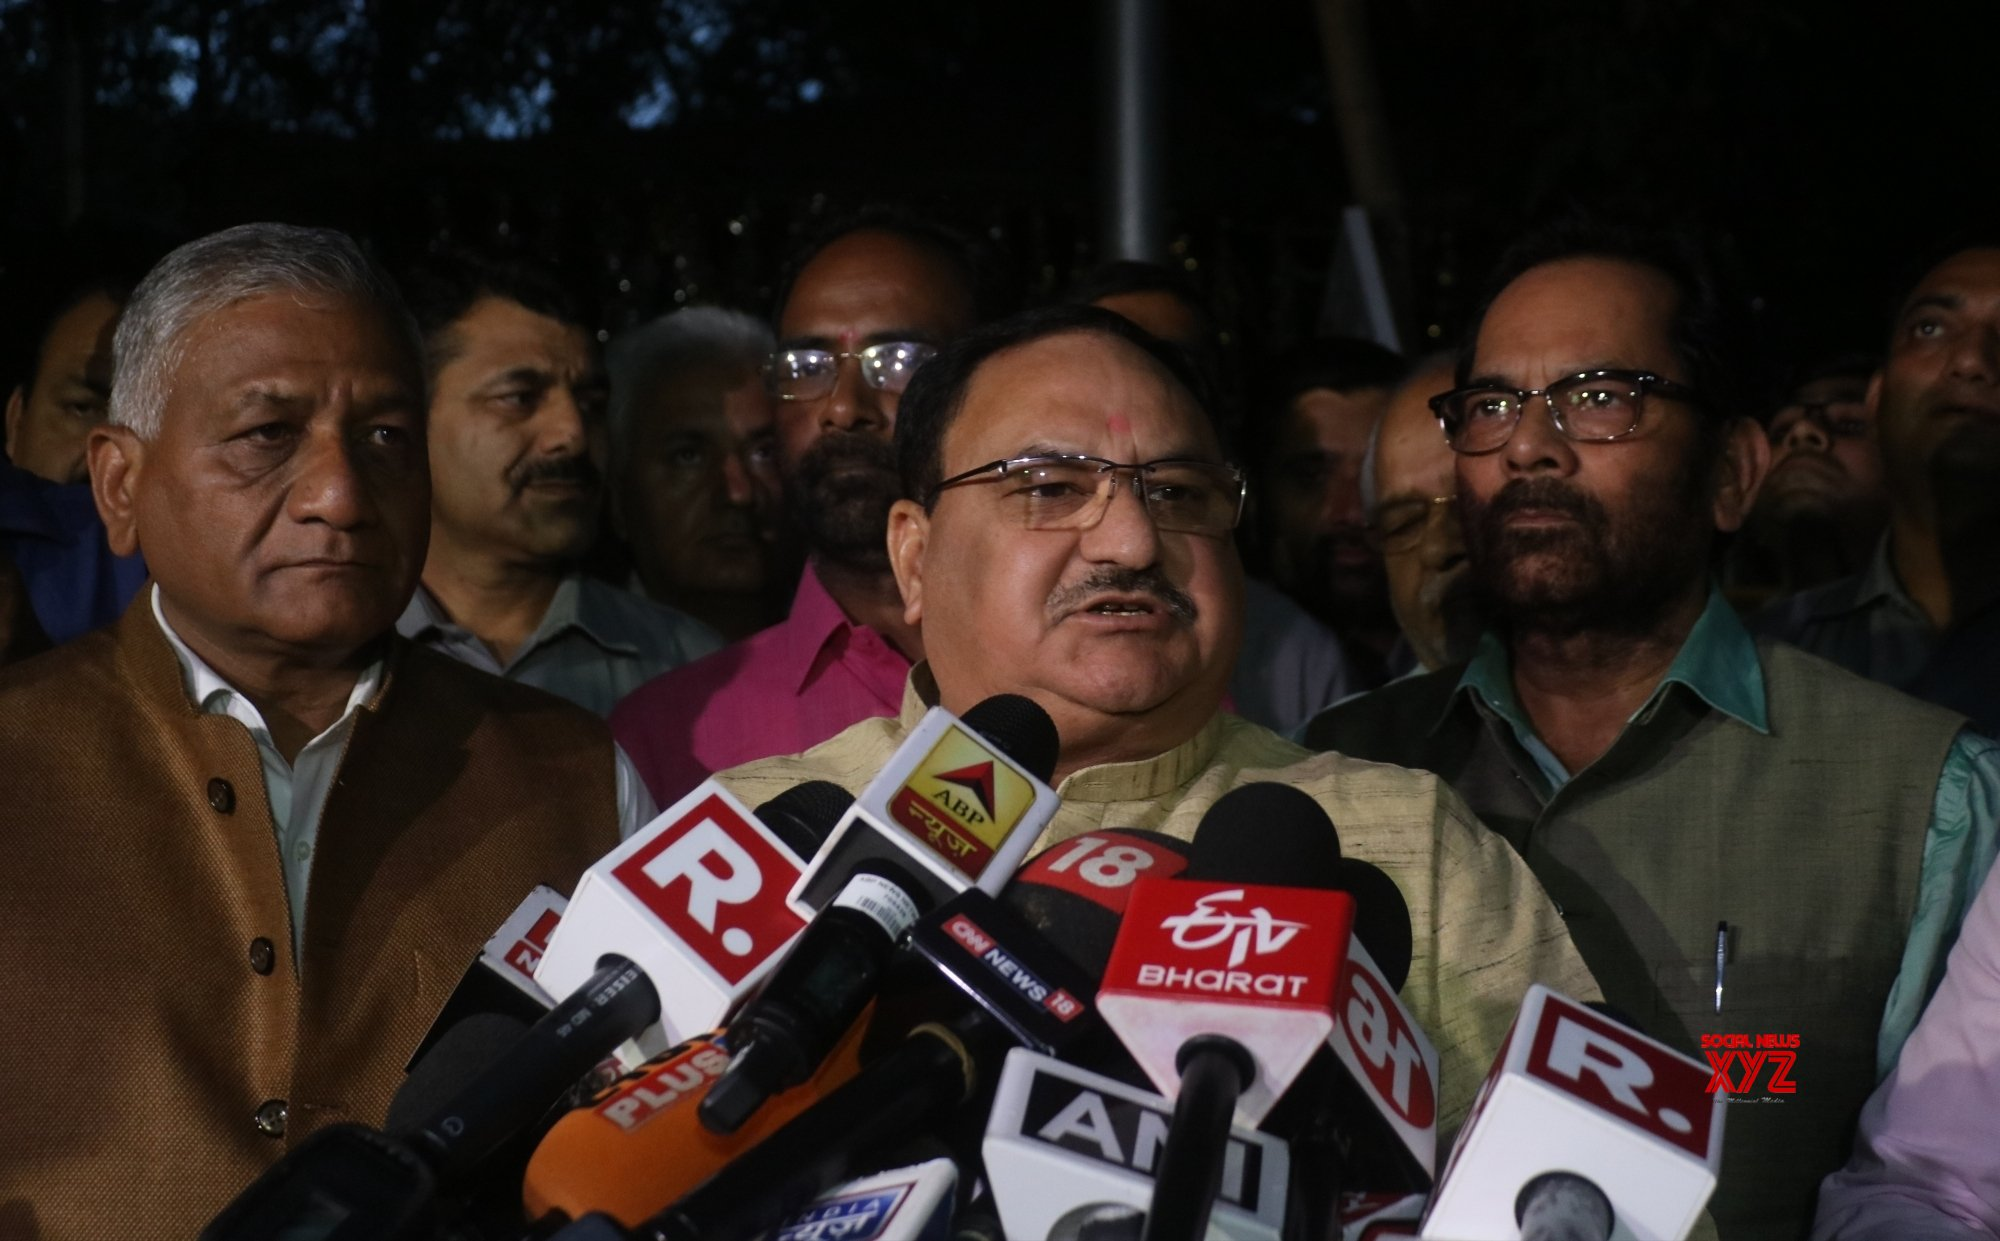 New Delhi: BJP delegation talks to the media after meeting CEC #Gallery